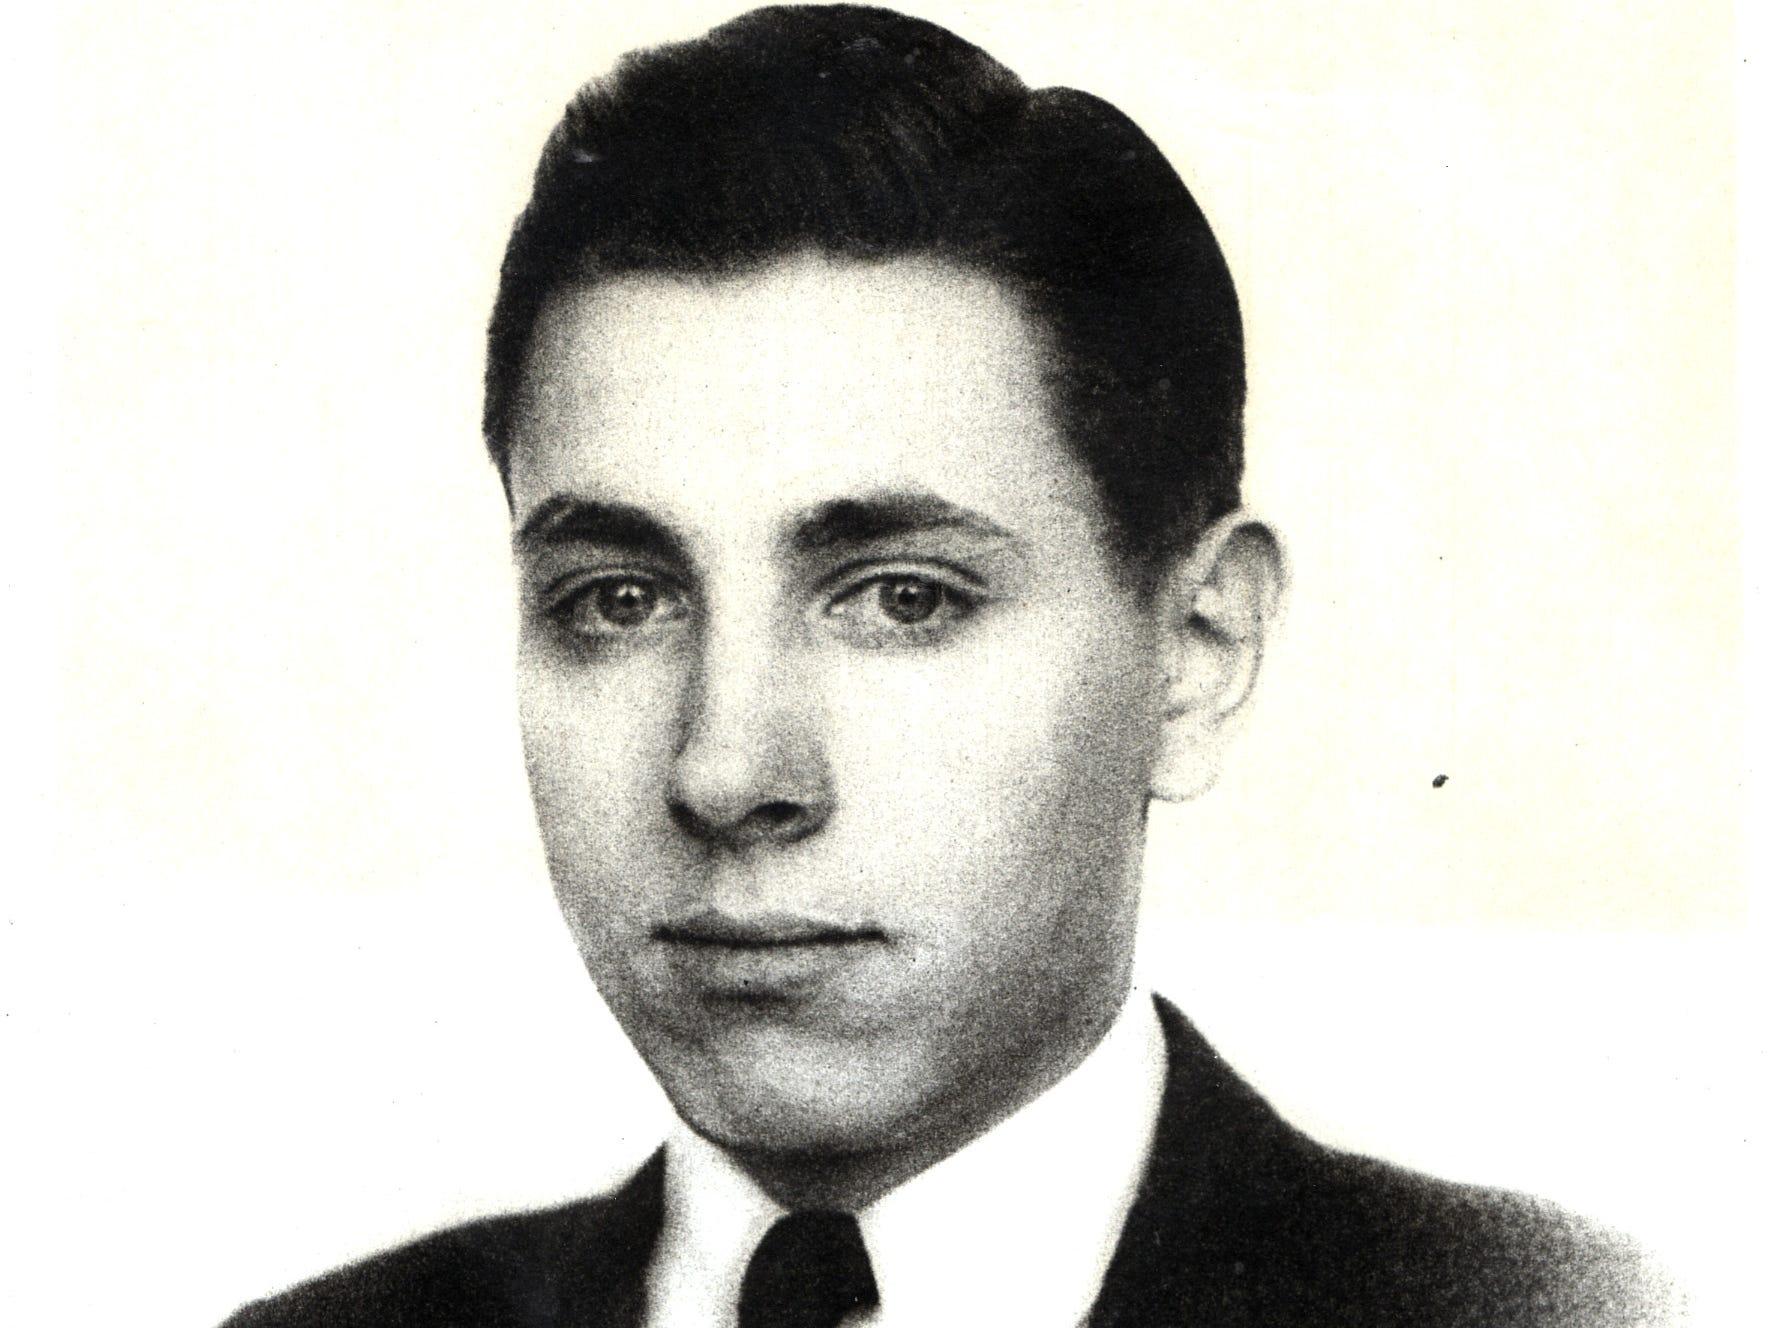 John David Laida Jr. during his time at Skaneateles, N.Y., High School, class of 1936.